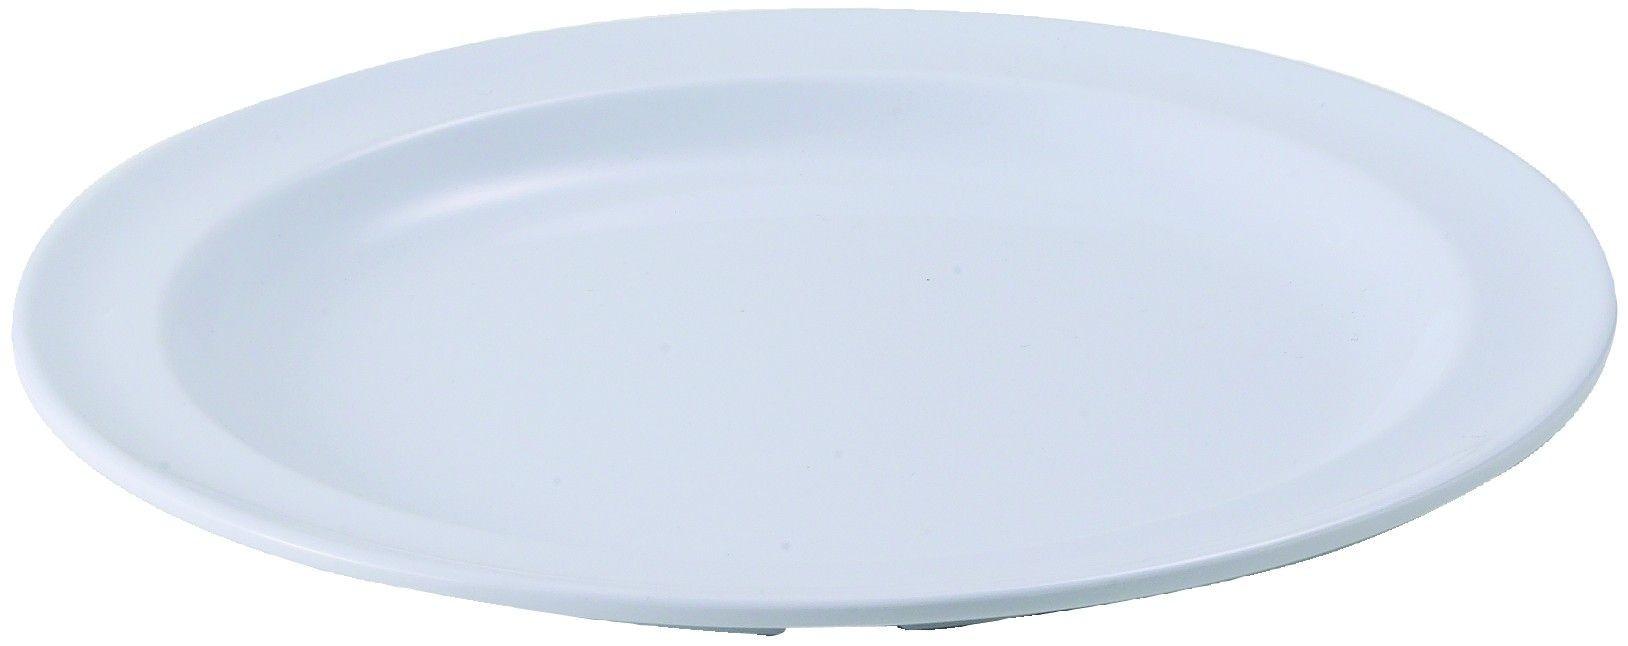 "Winco MMPR-8W White Melamine 8"" Round Plate"